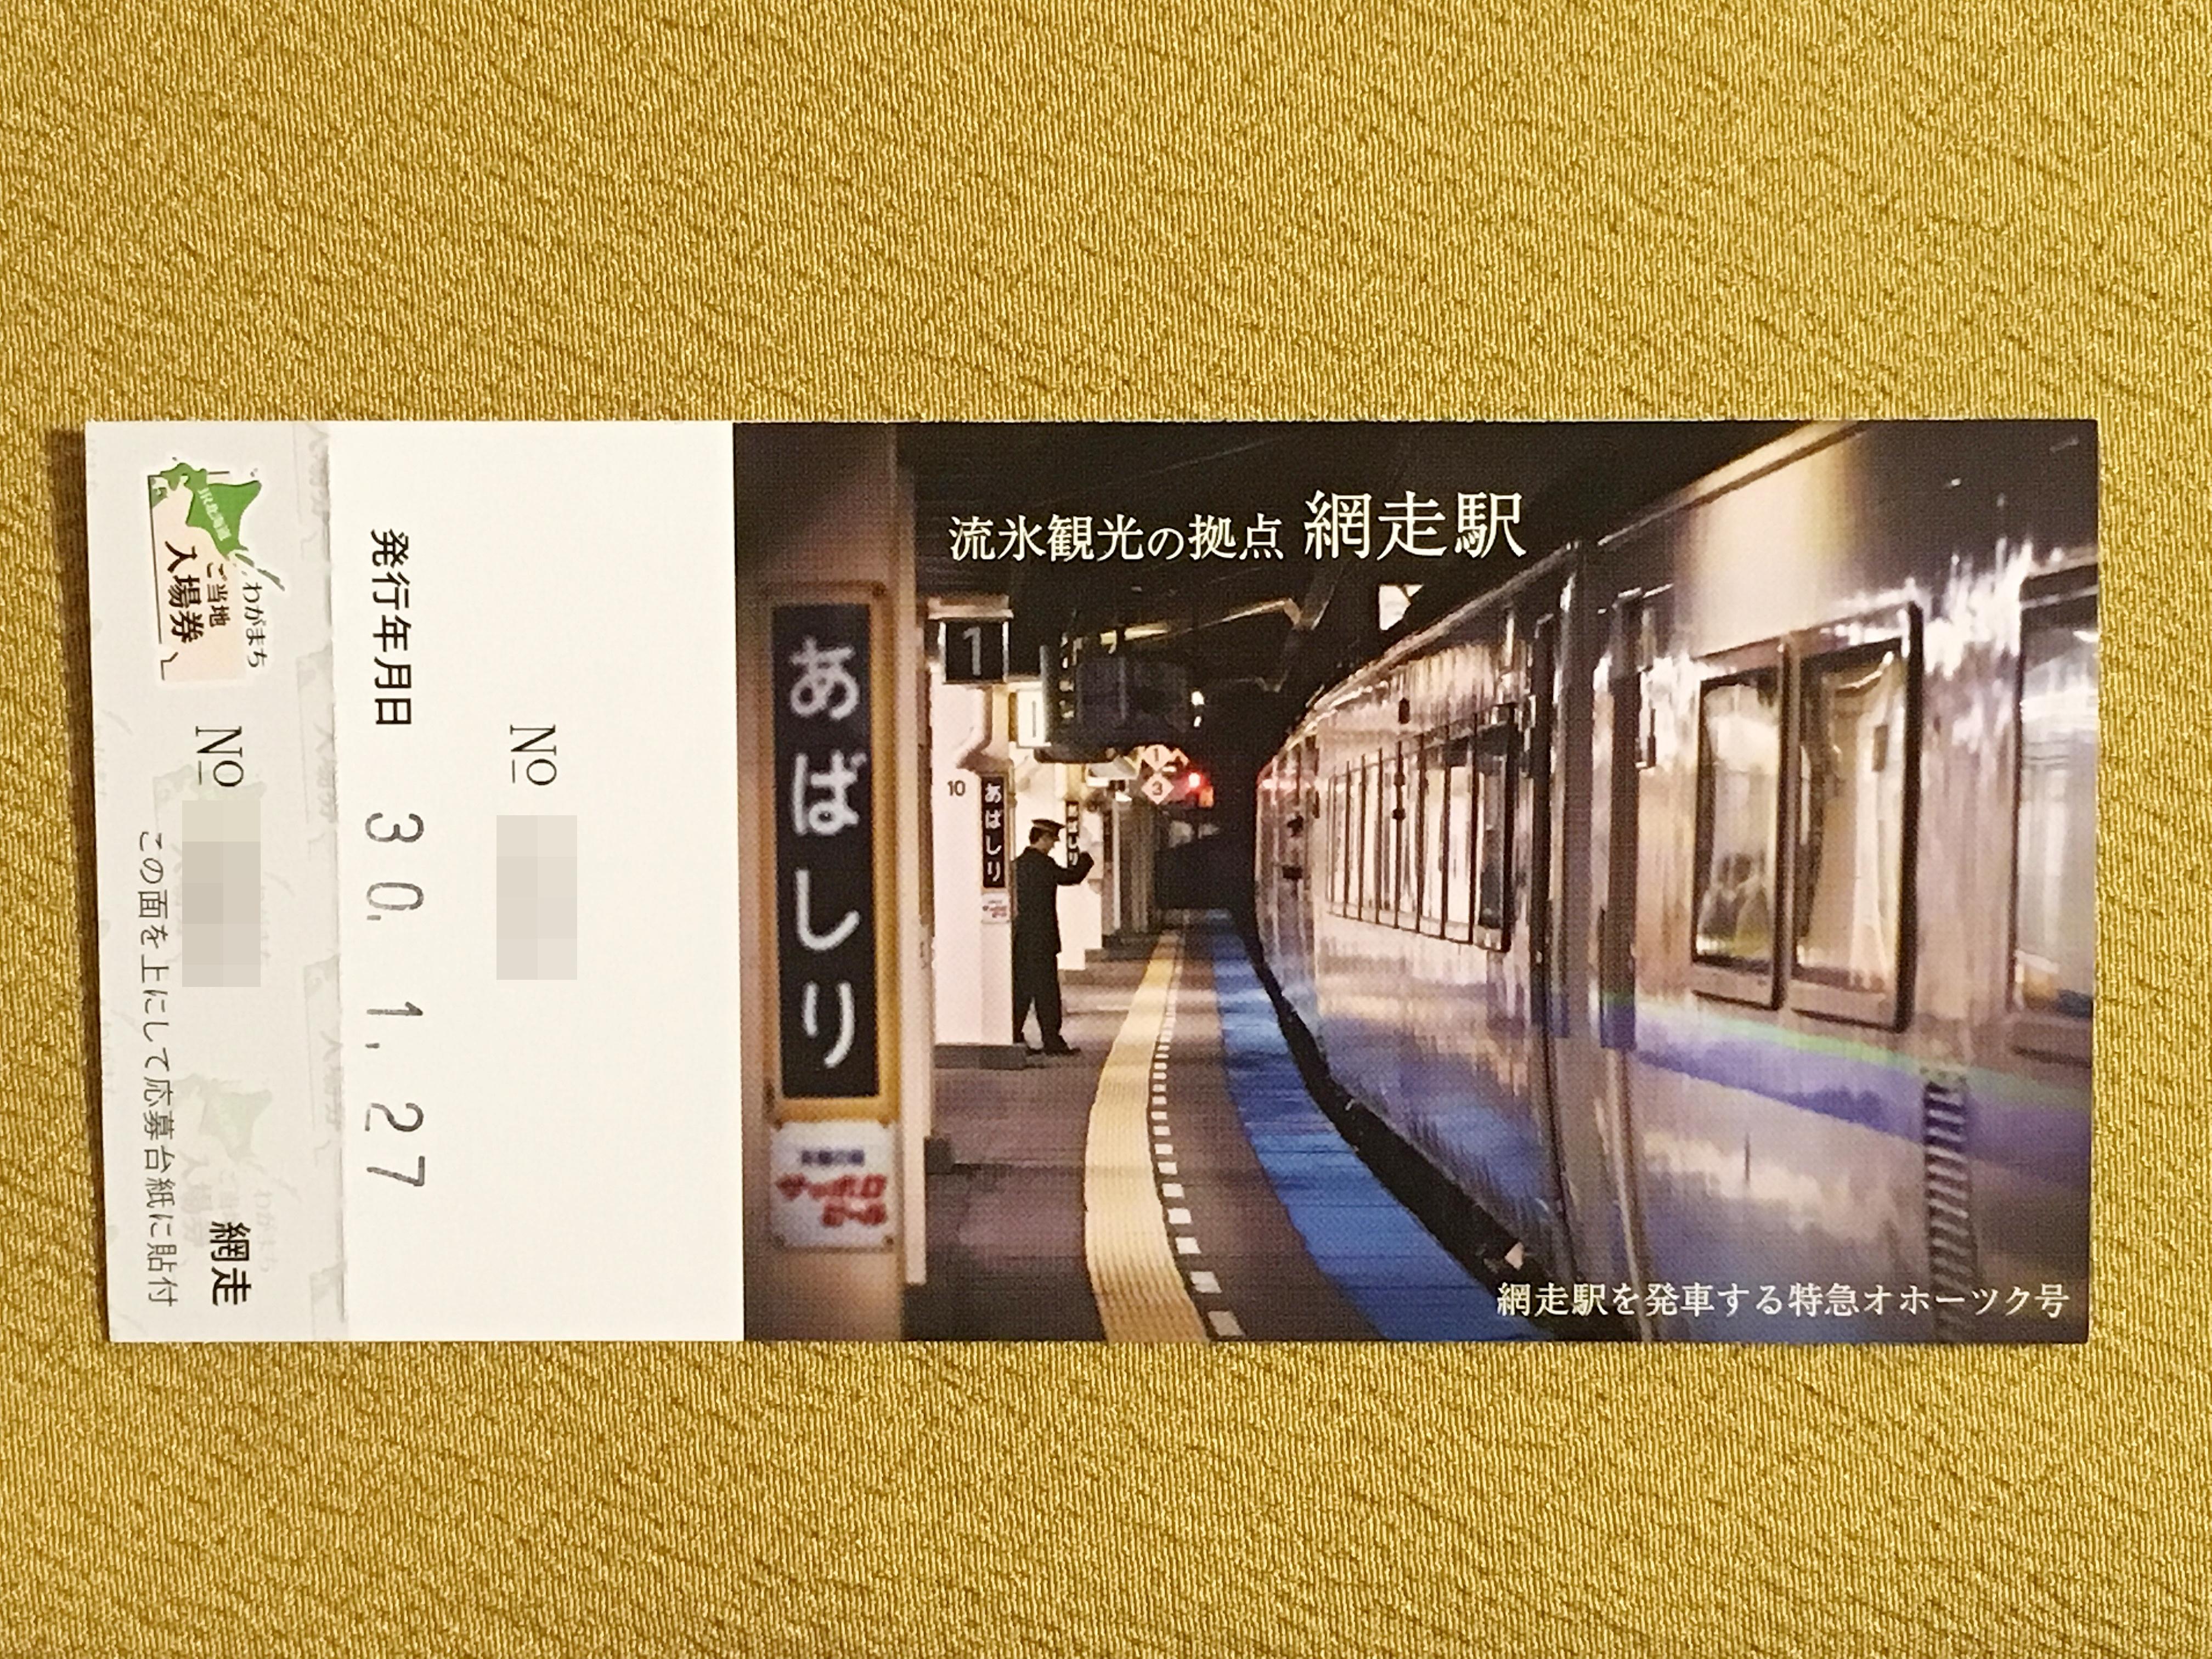 JR北海道ご当地入場券  網走駅裏.JPG